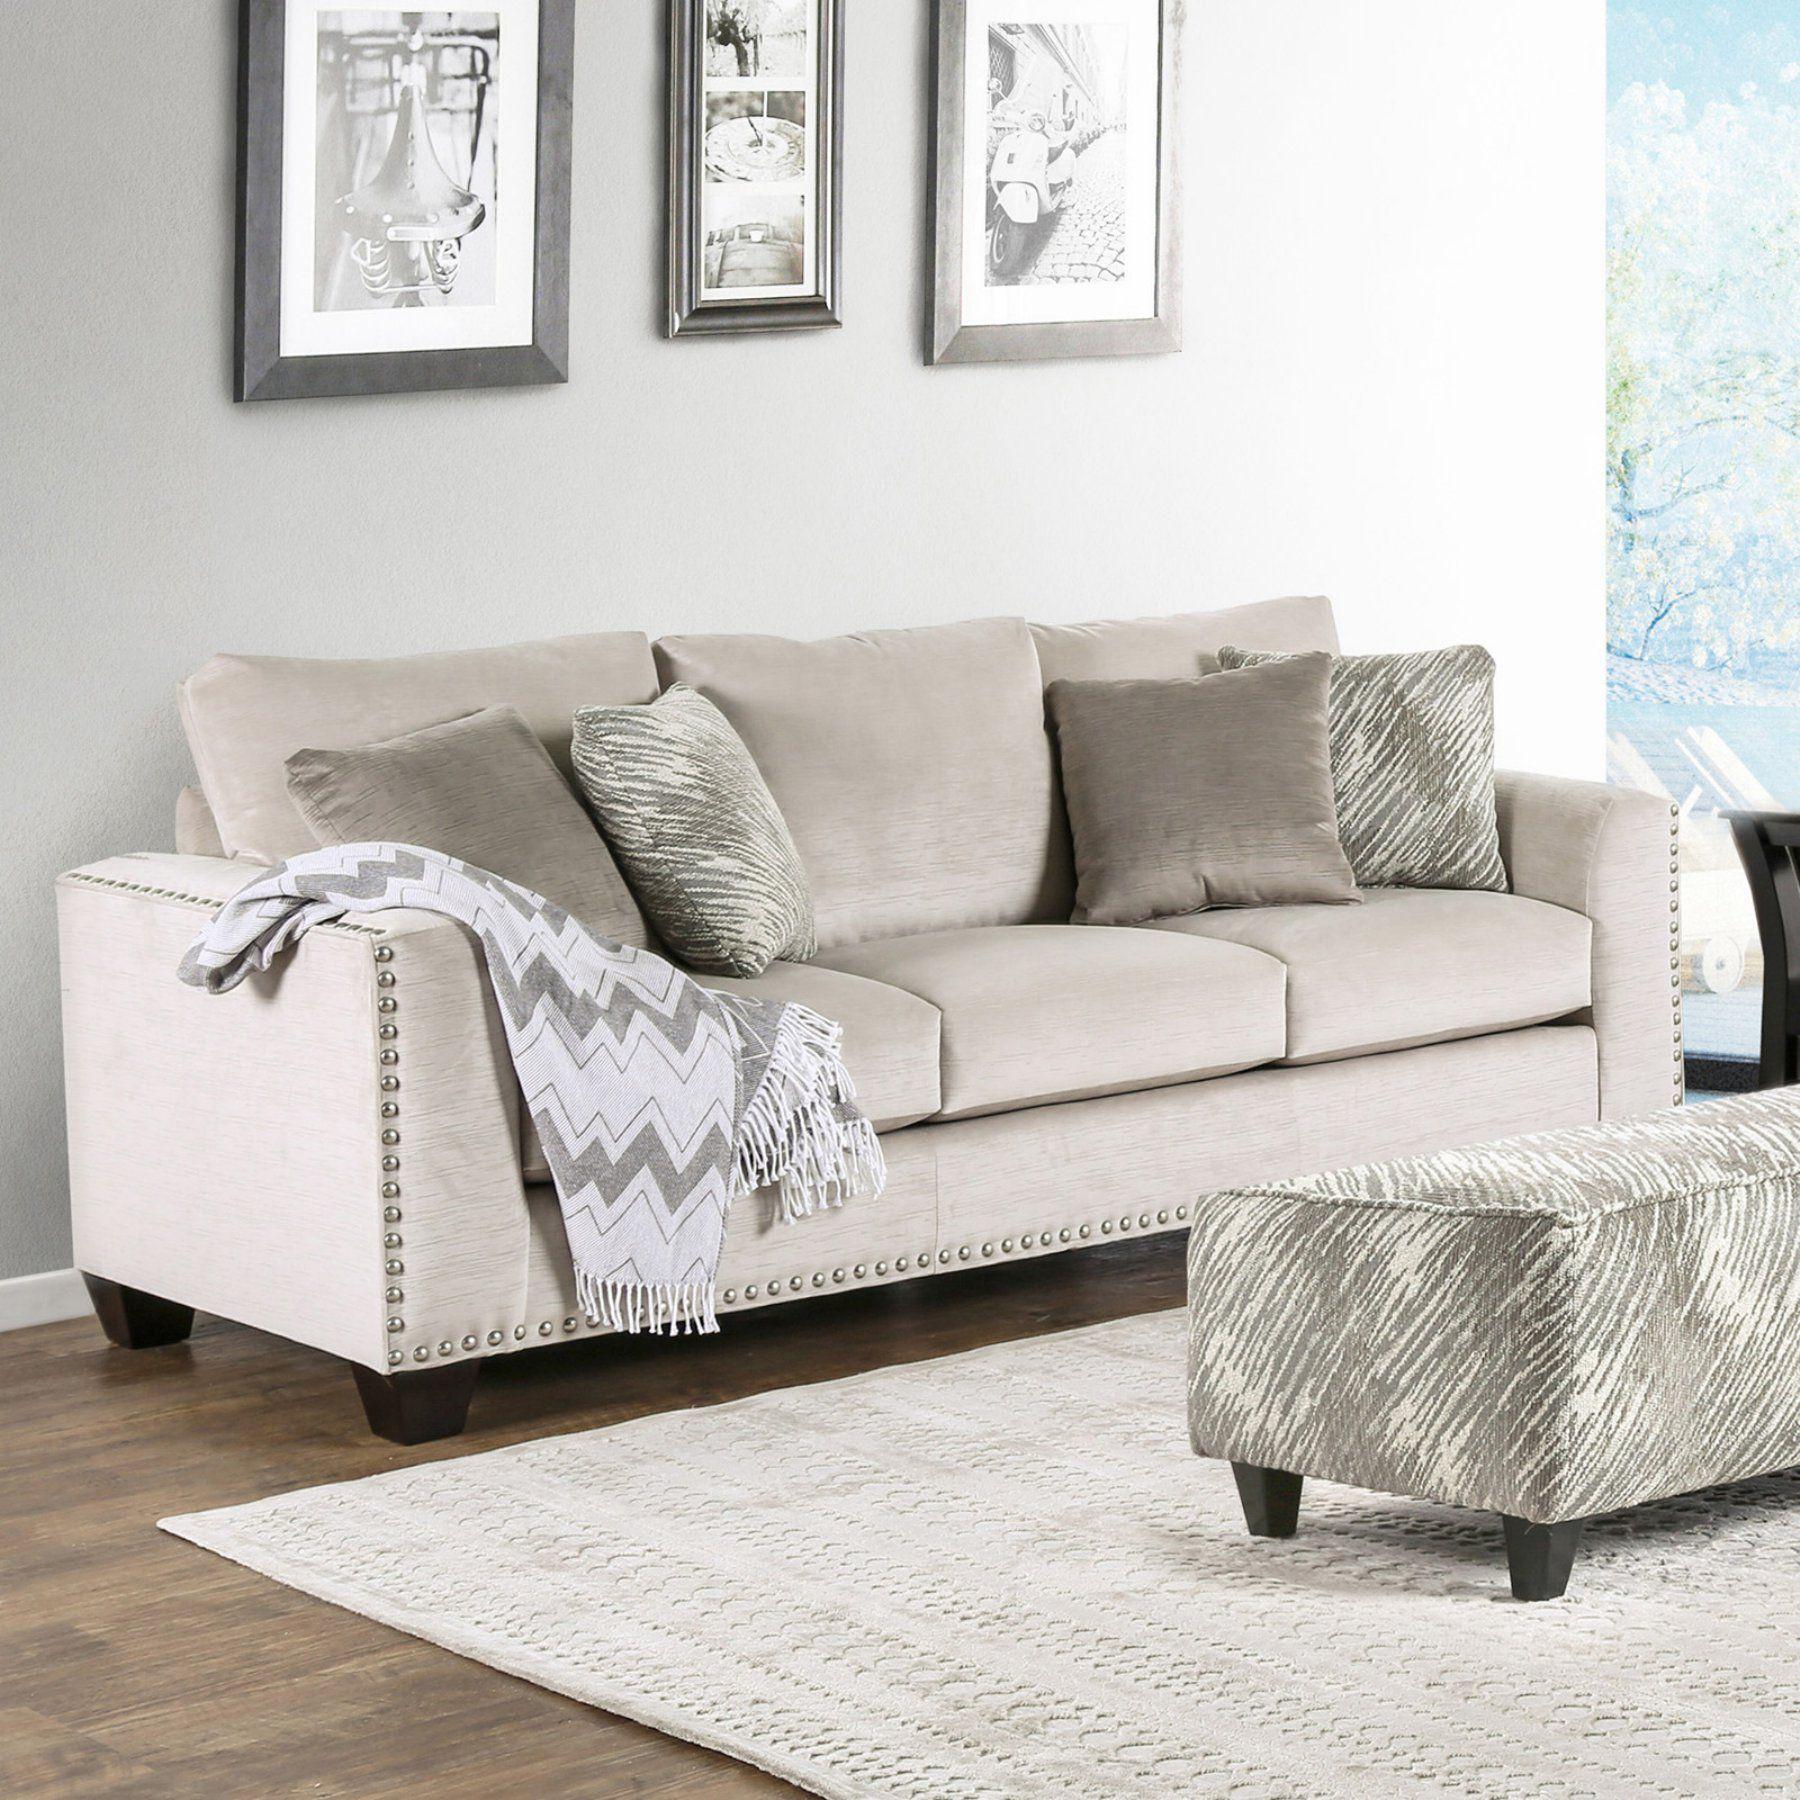 Furniture Of America Fiona Contemporary Sofa Furniture